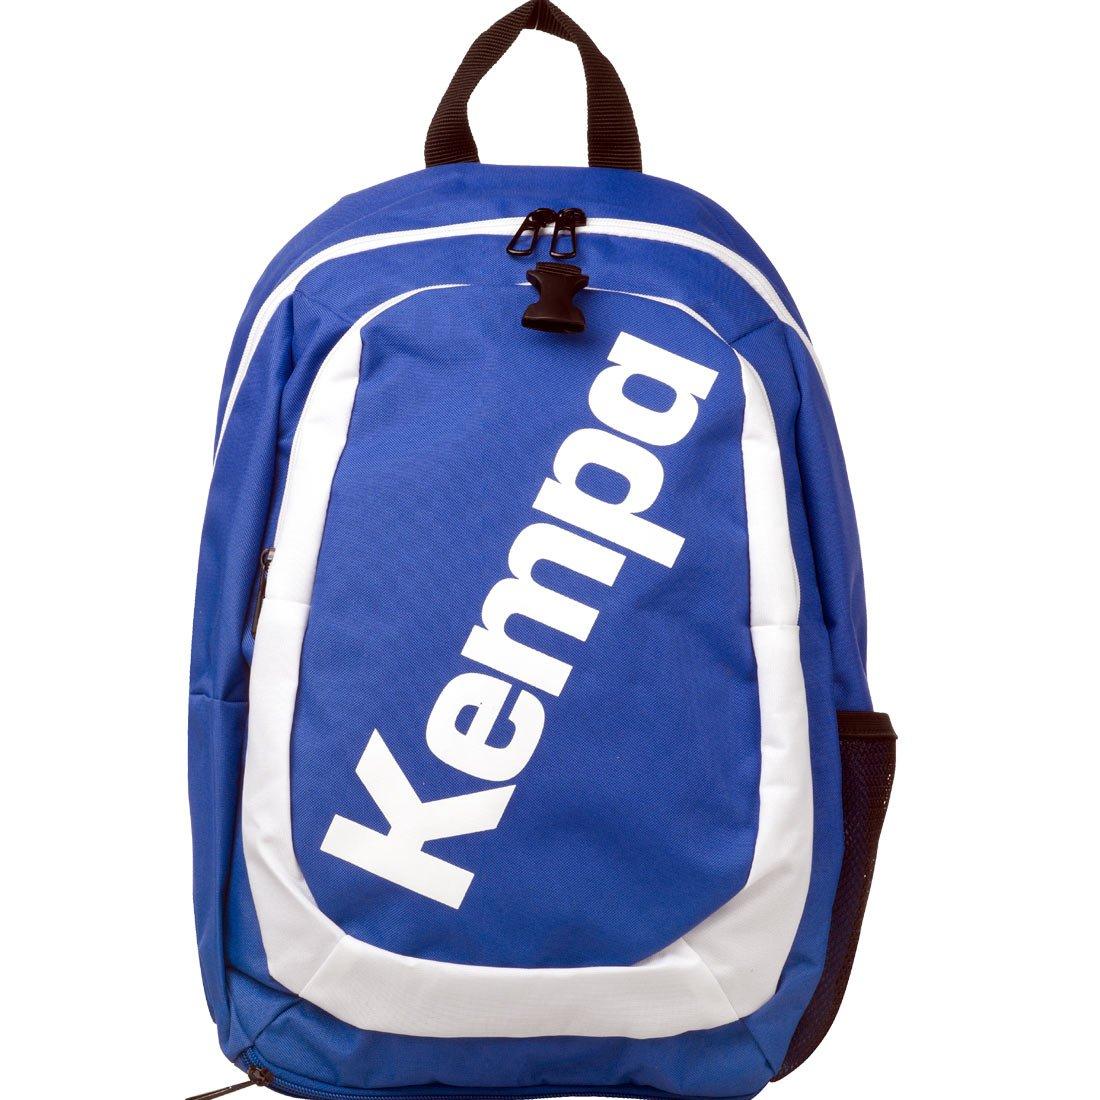 Kempa - Mochila (tamaño 16 x 16 x 30 cm, 30 l), color azul